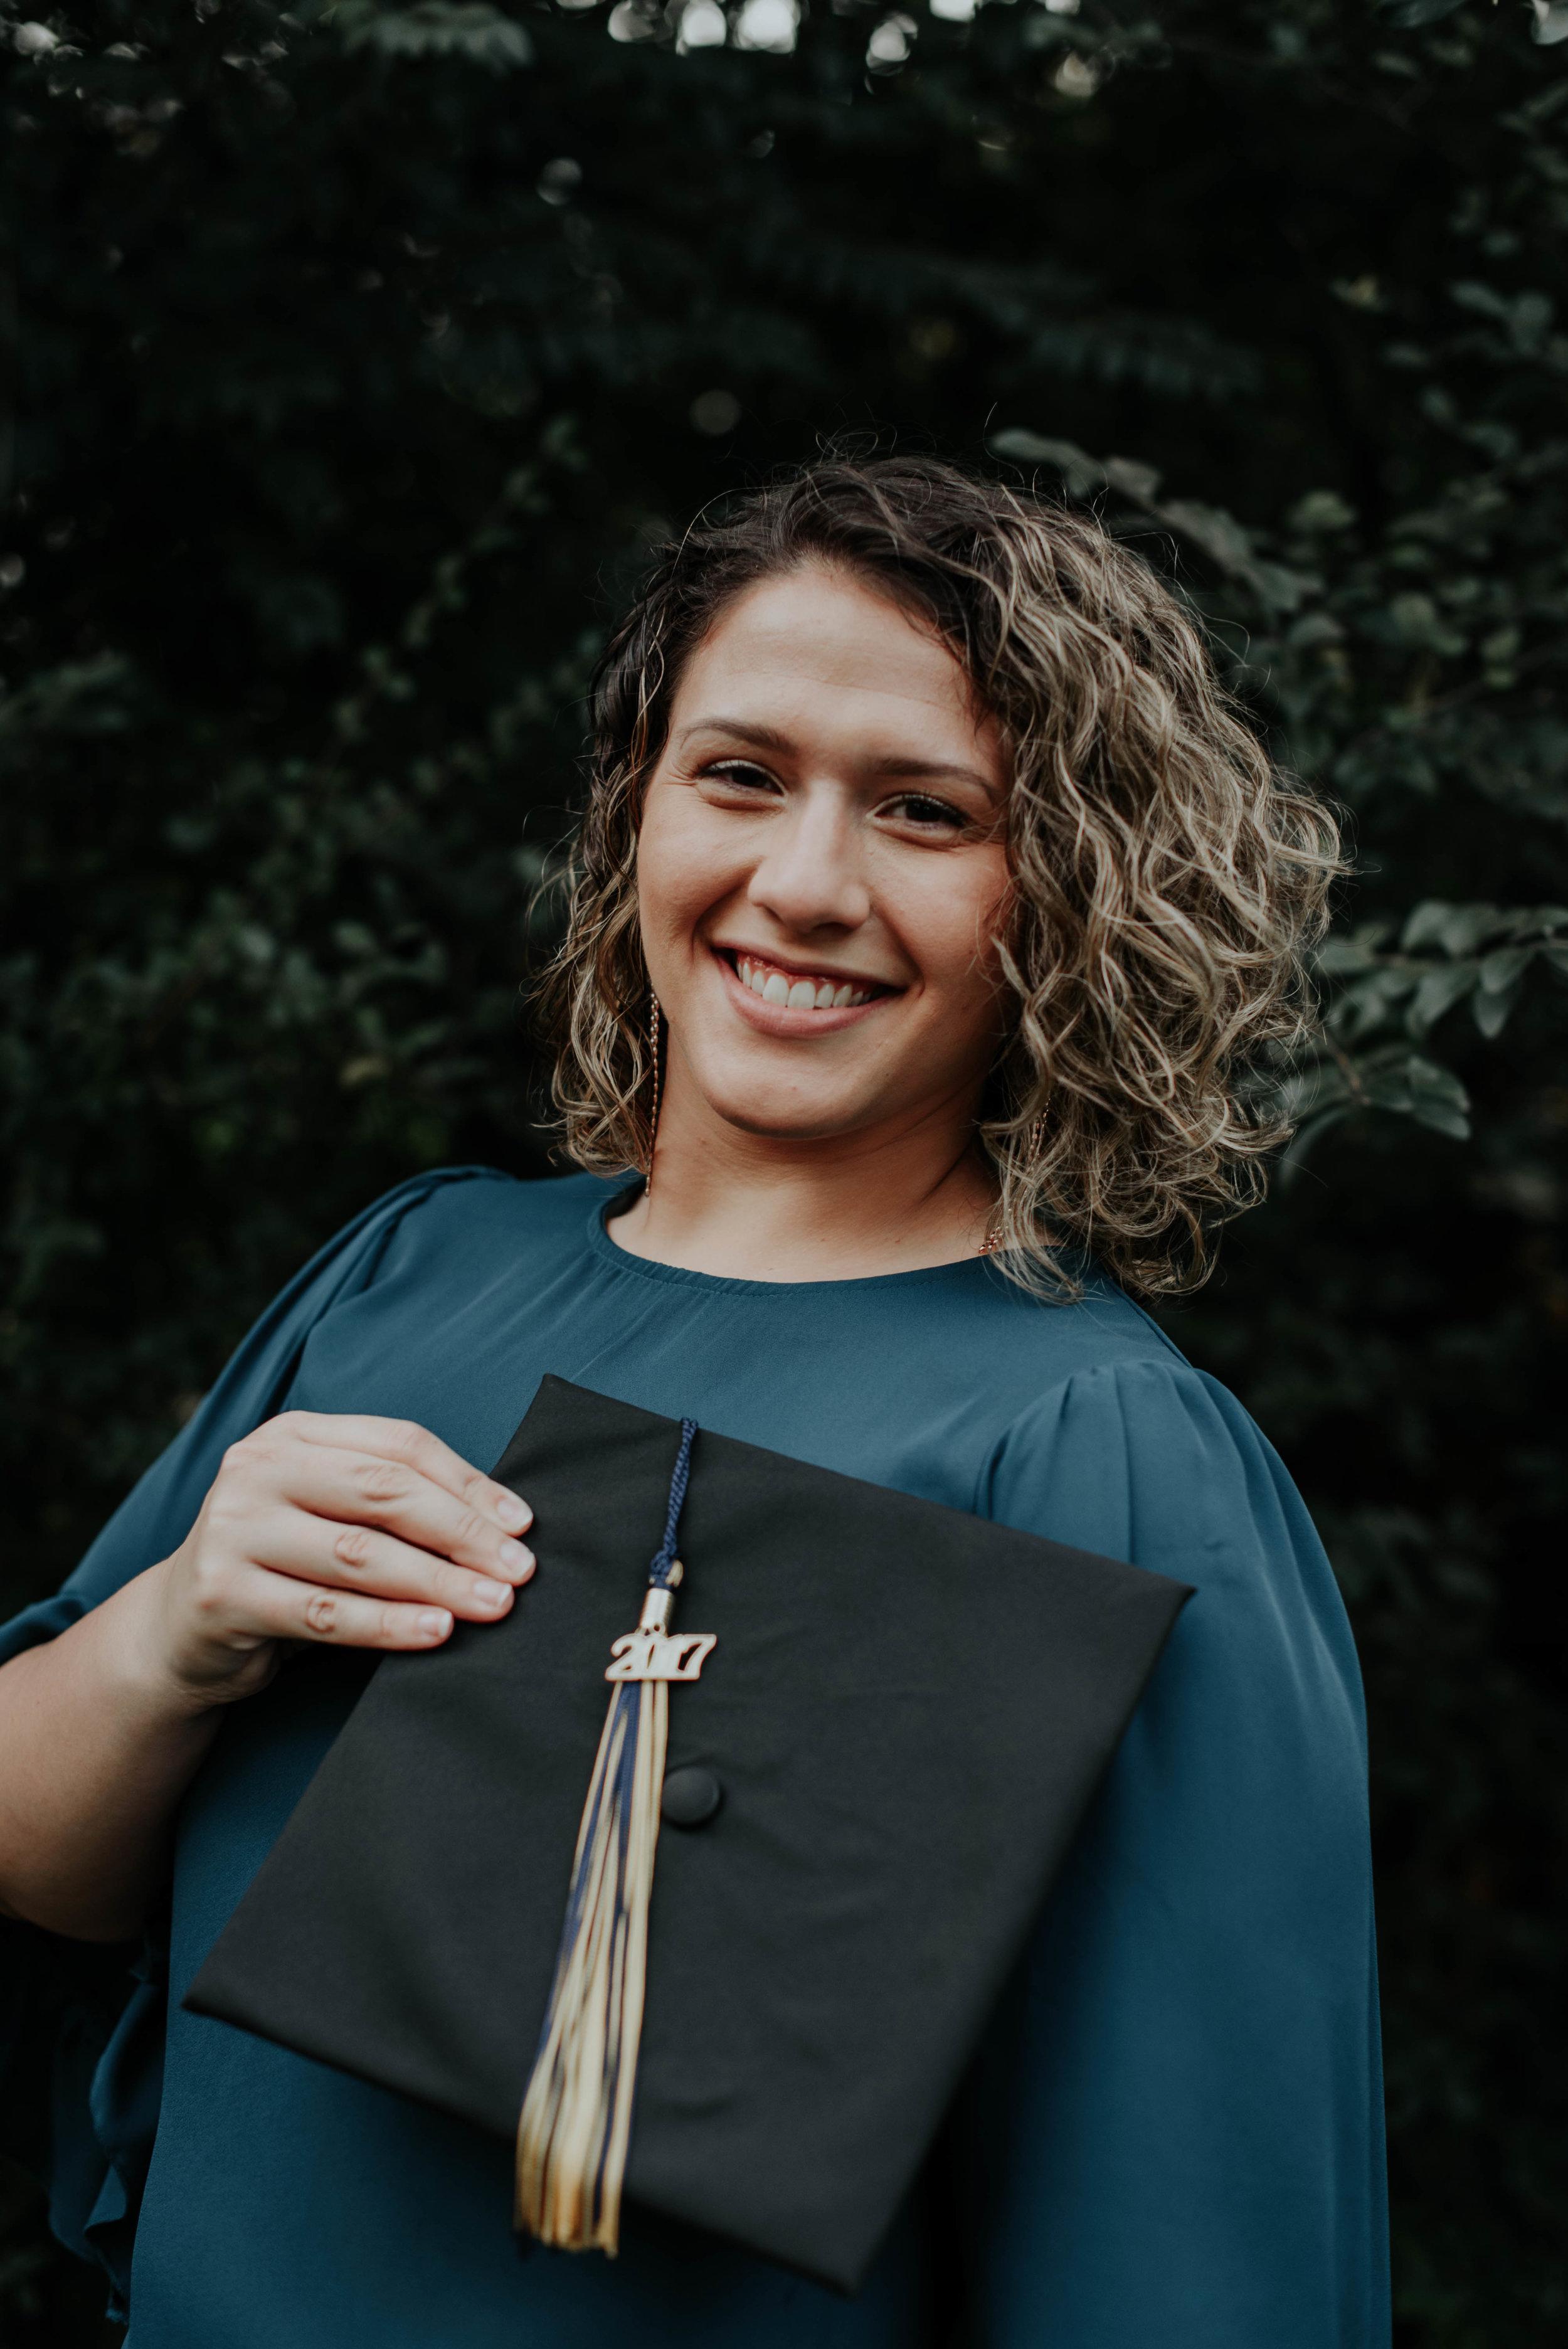 Erin-Kirkpatrick-Photography-Victoria-Graduation-Oct-2017-25.jpg